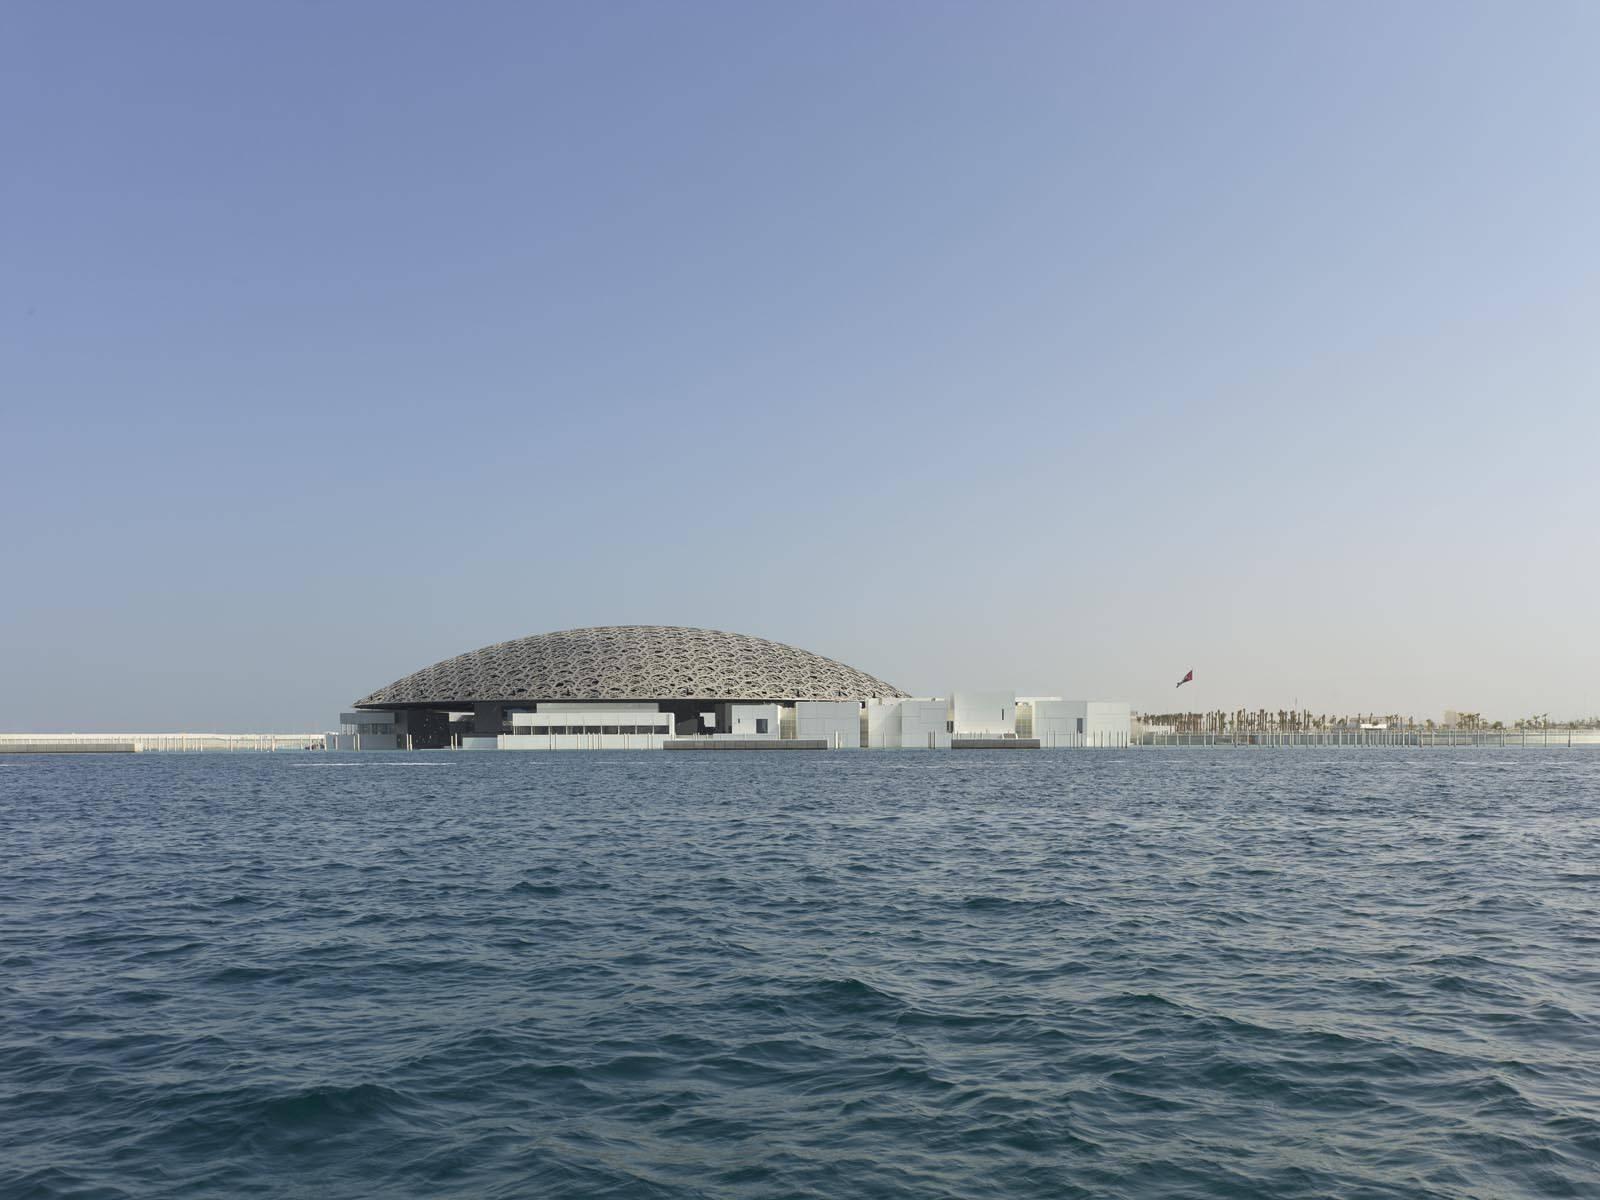 Formule 1 Abu Dhabi - 1 december 2019